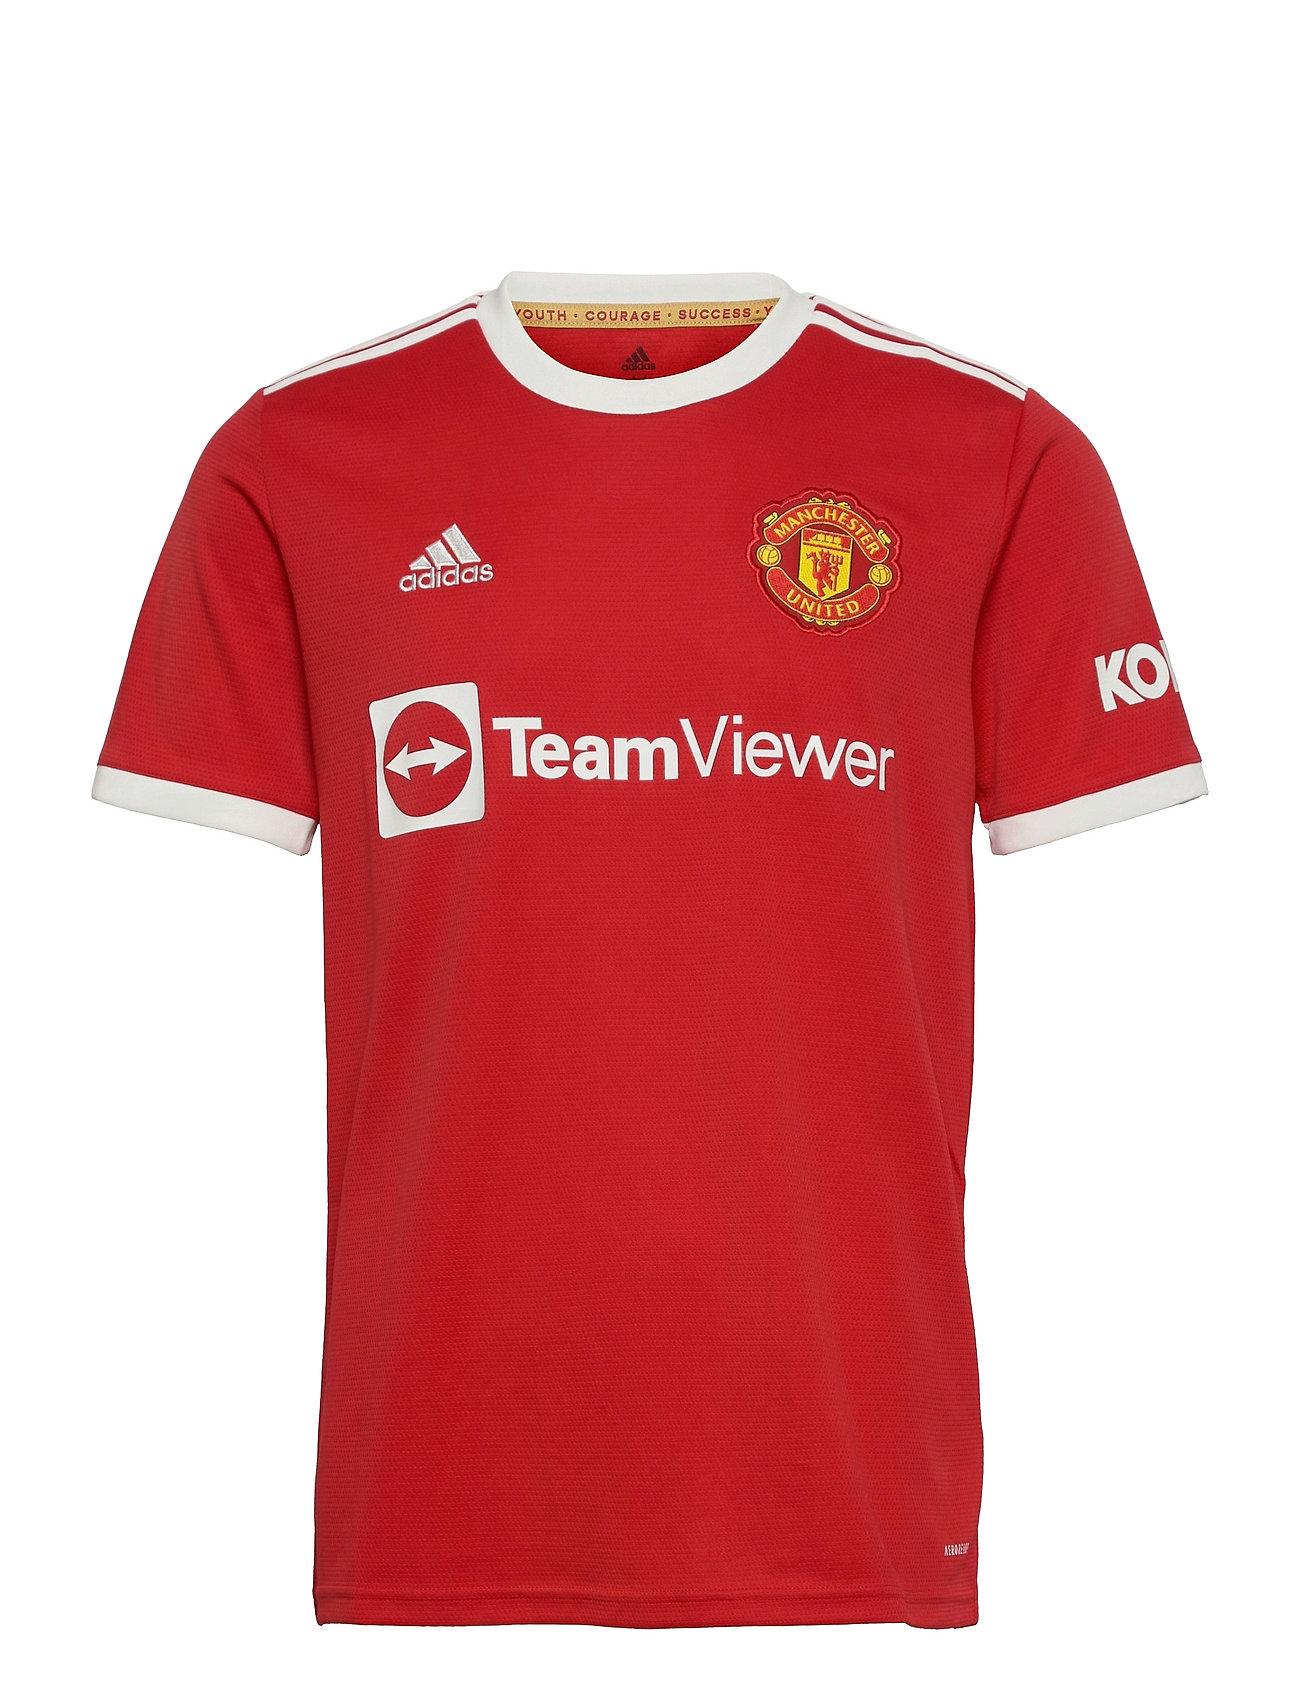 Manchester United 21/22 Home Jersey T-shirts Football Shirts Rød Adidas Performance